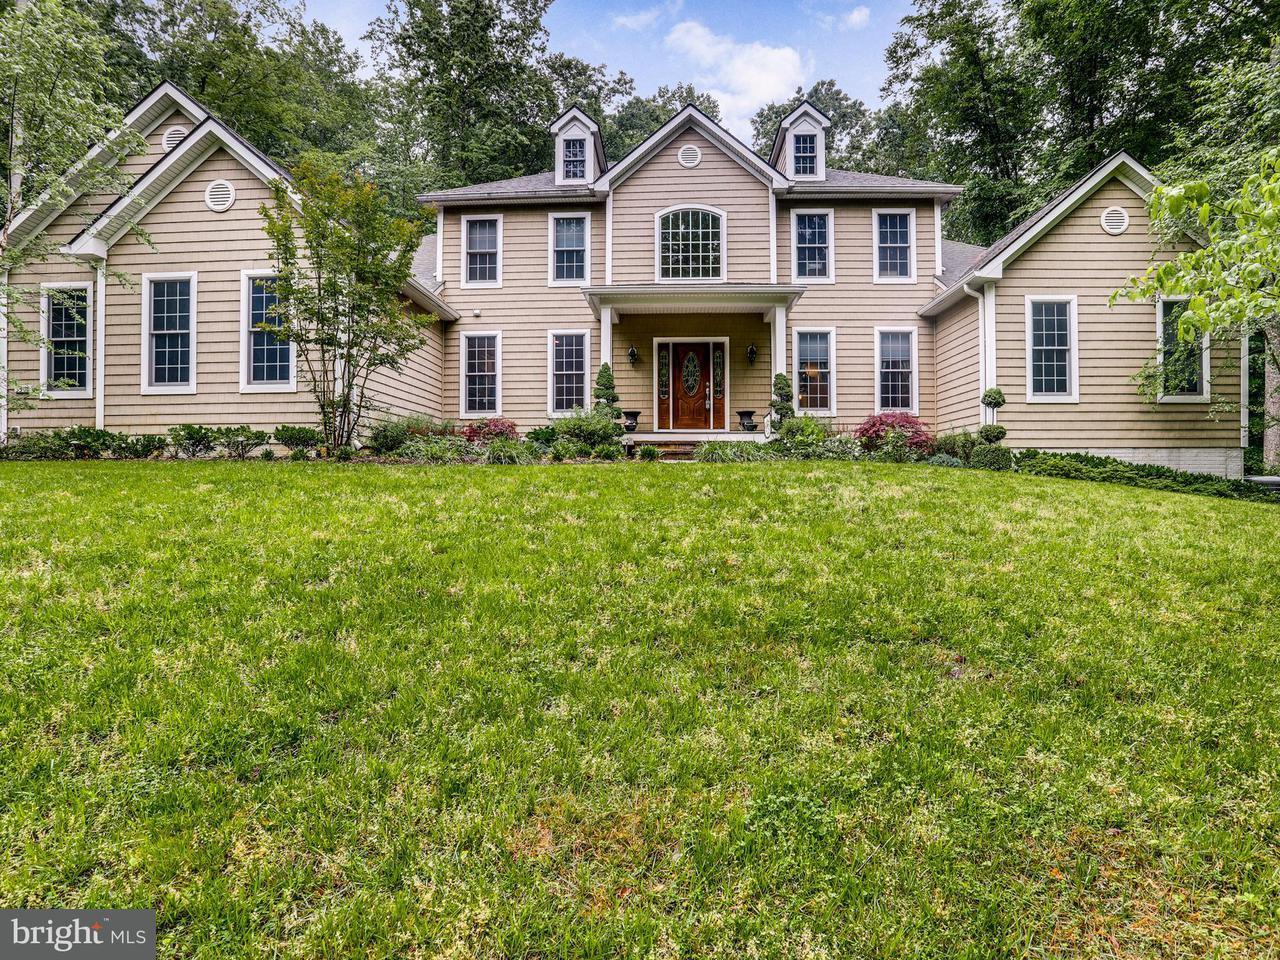 Casa Unifamiliar por un Venta en 3301 CHURCHILL FARM Road 3301 CHURCHILL FARM Road Davidsonville, Maryland 21035 Estados Unidos